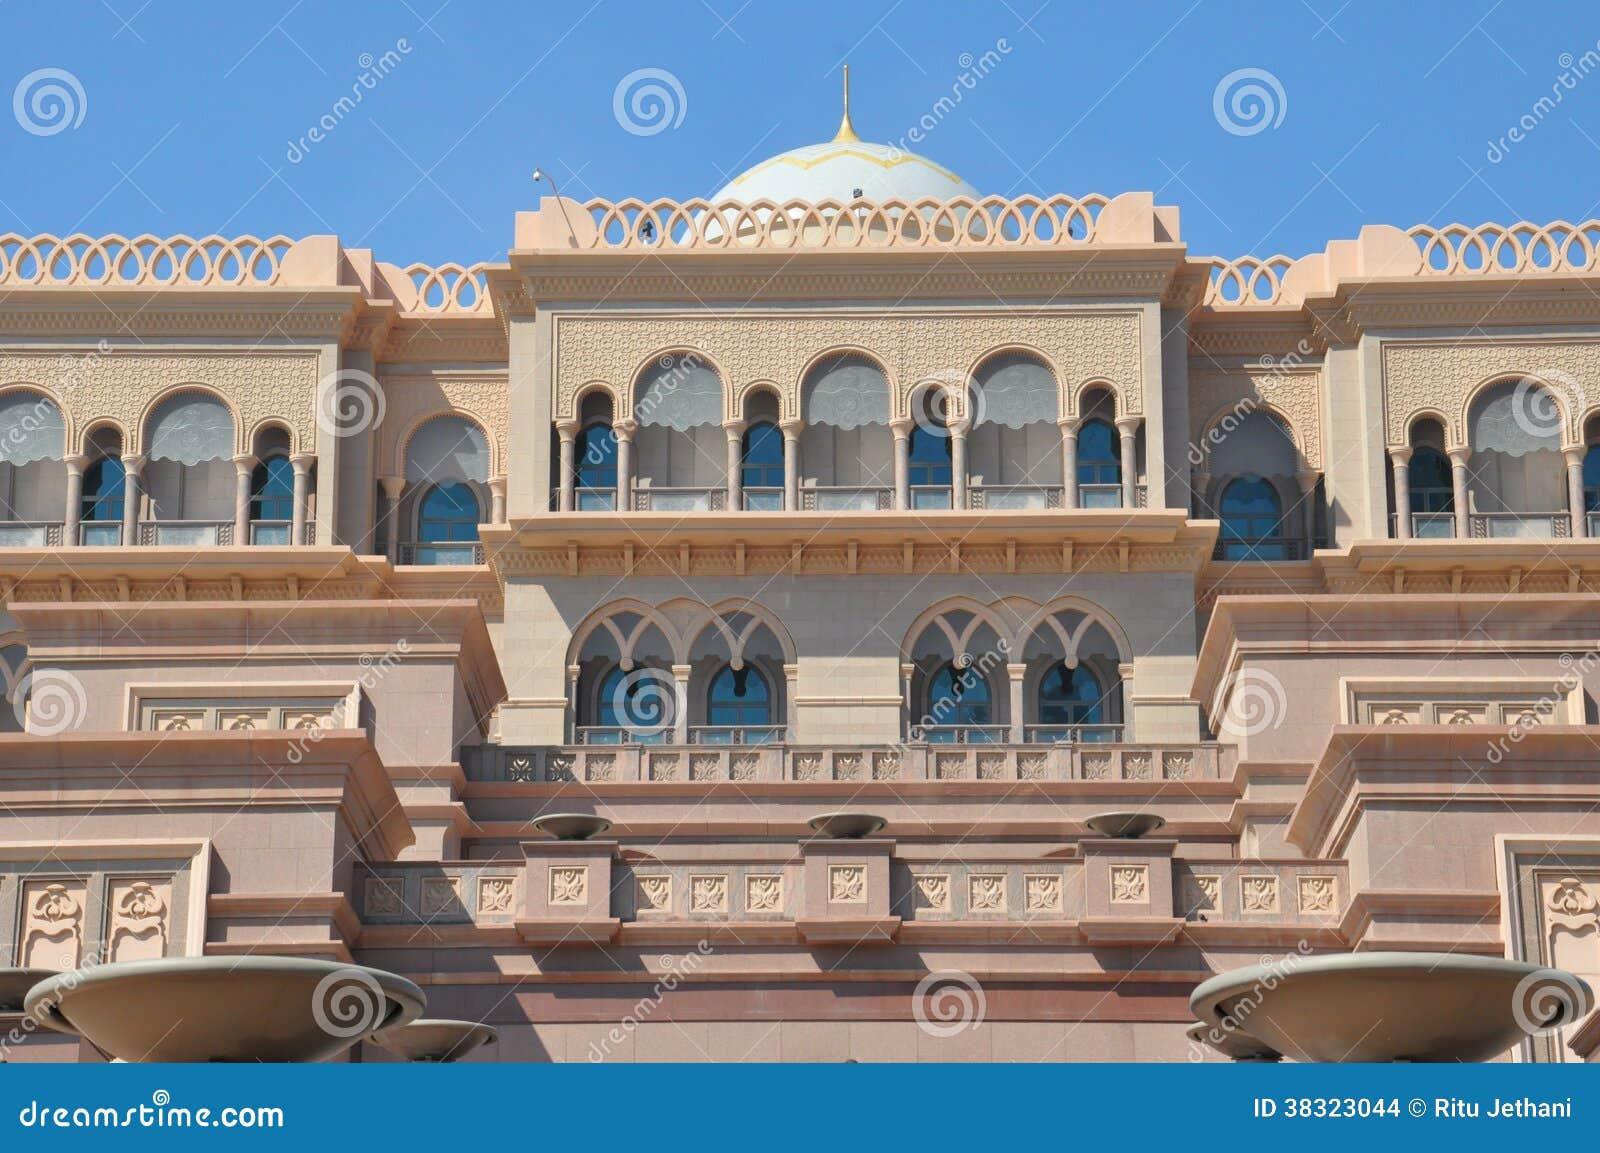 Emirat Palast Hotel In Abu Dhabi Uae Redaktionelles Stockbild